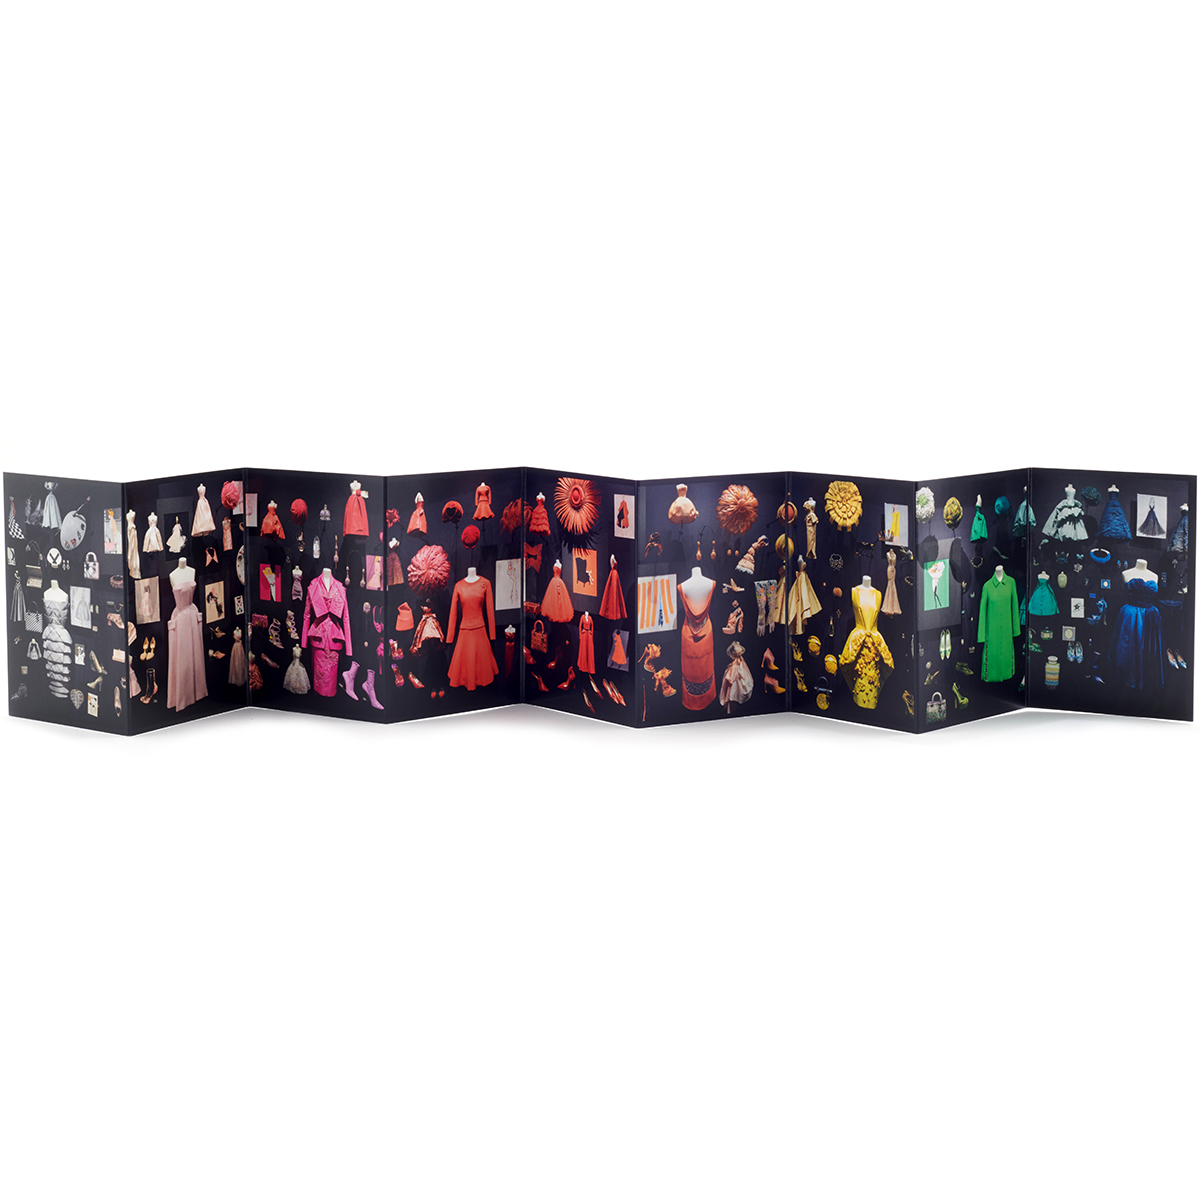 Diorama – mini concertina print